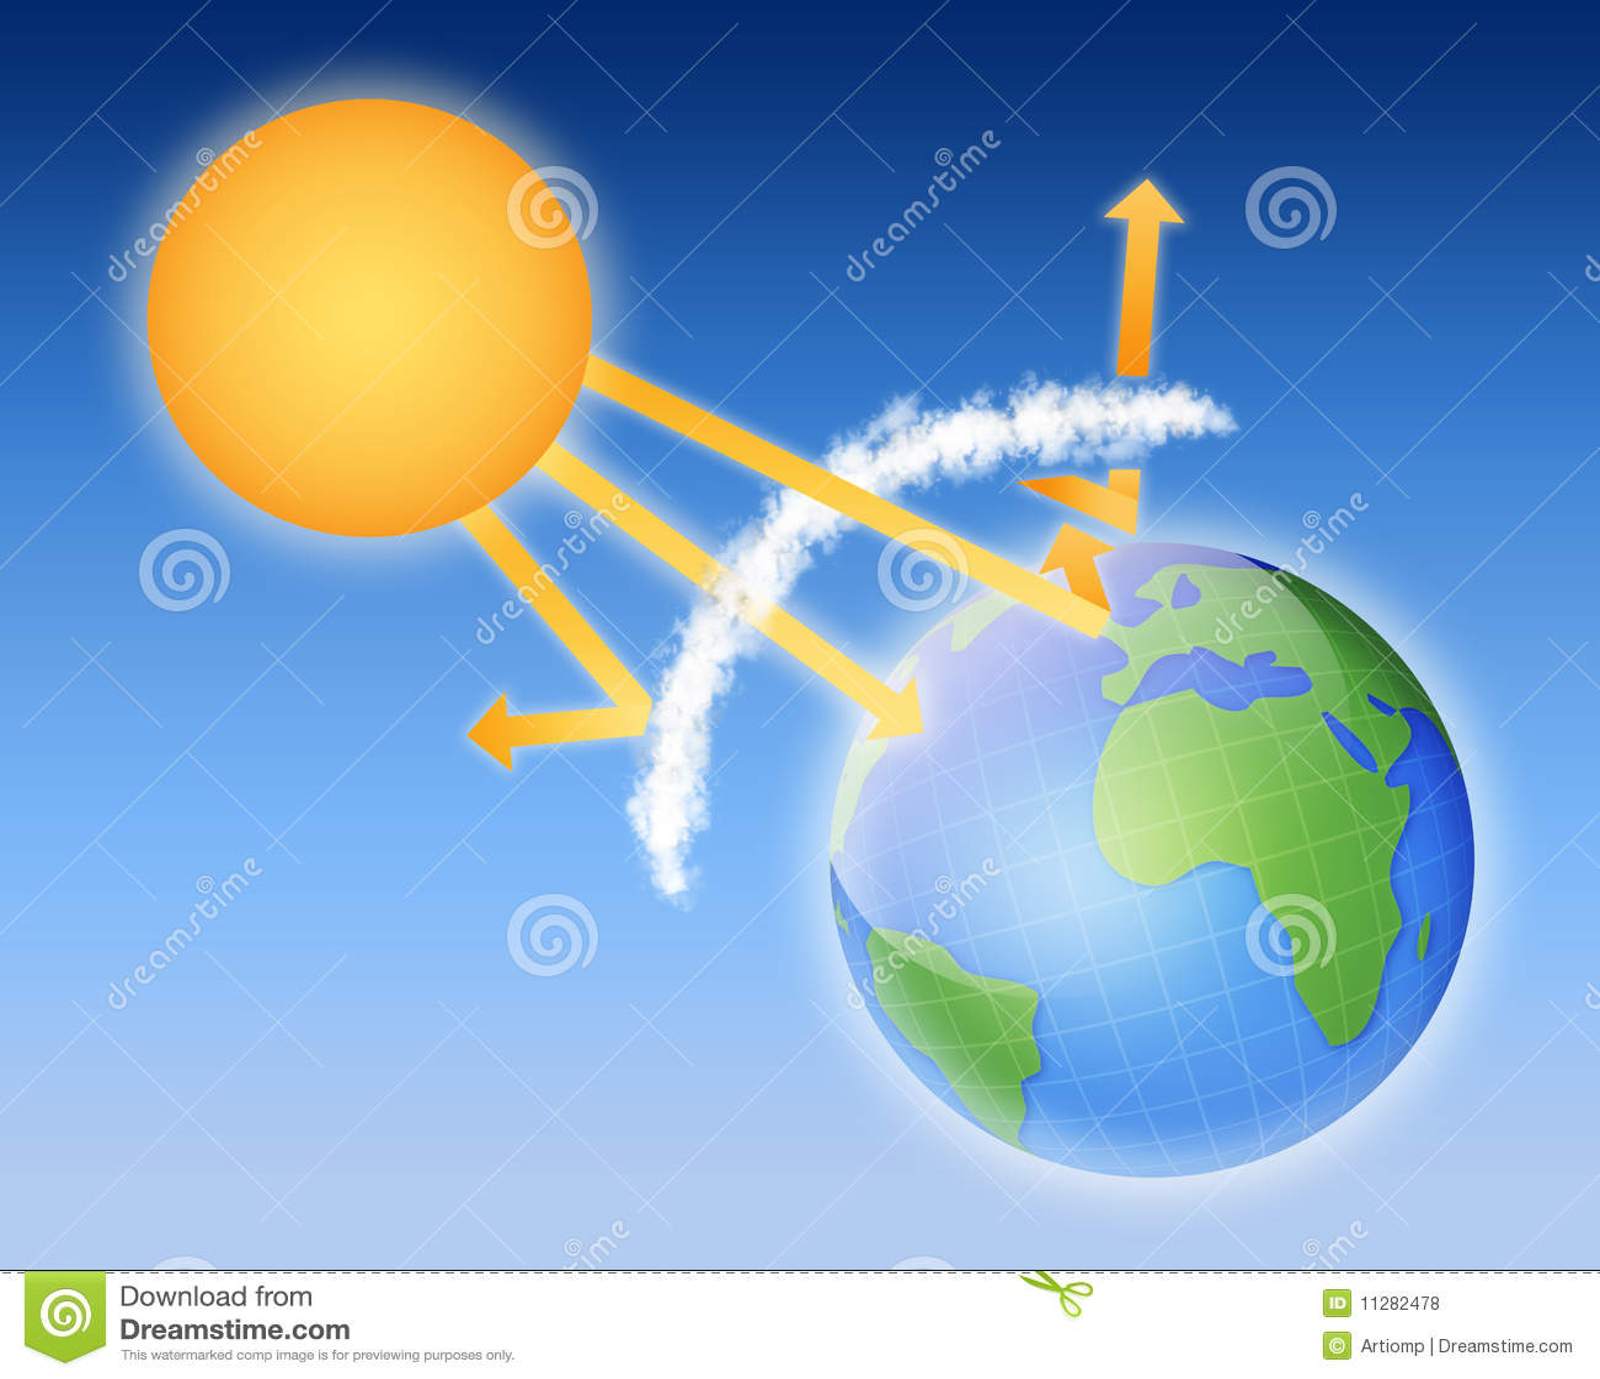 Earth atmosphere scheme